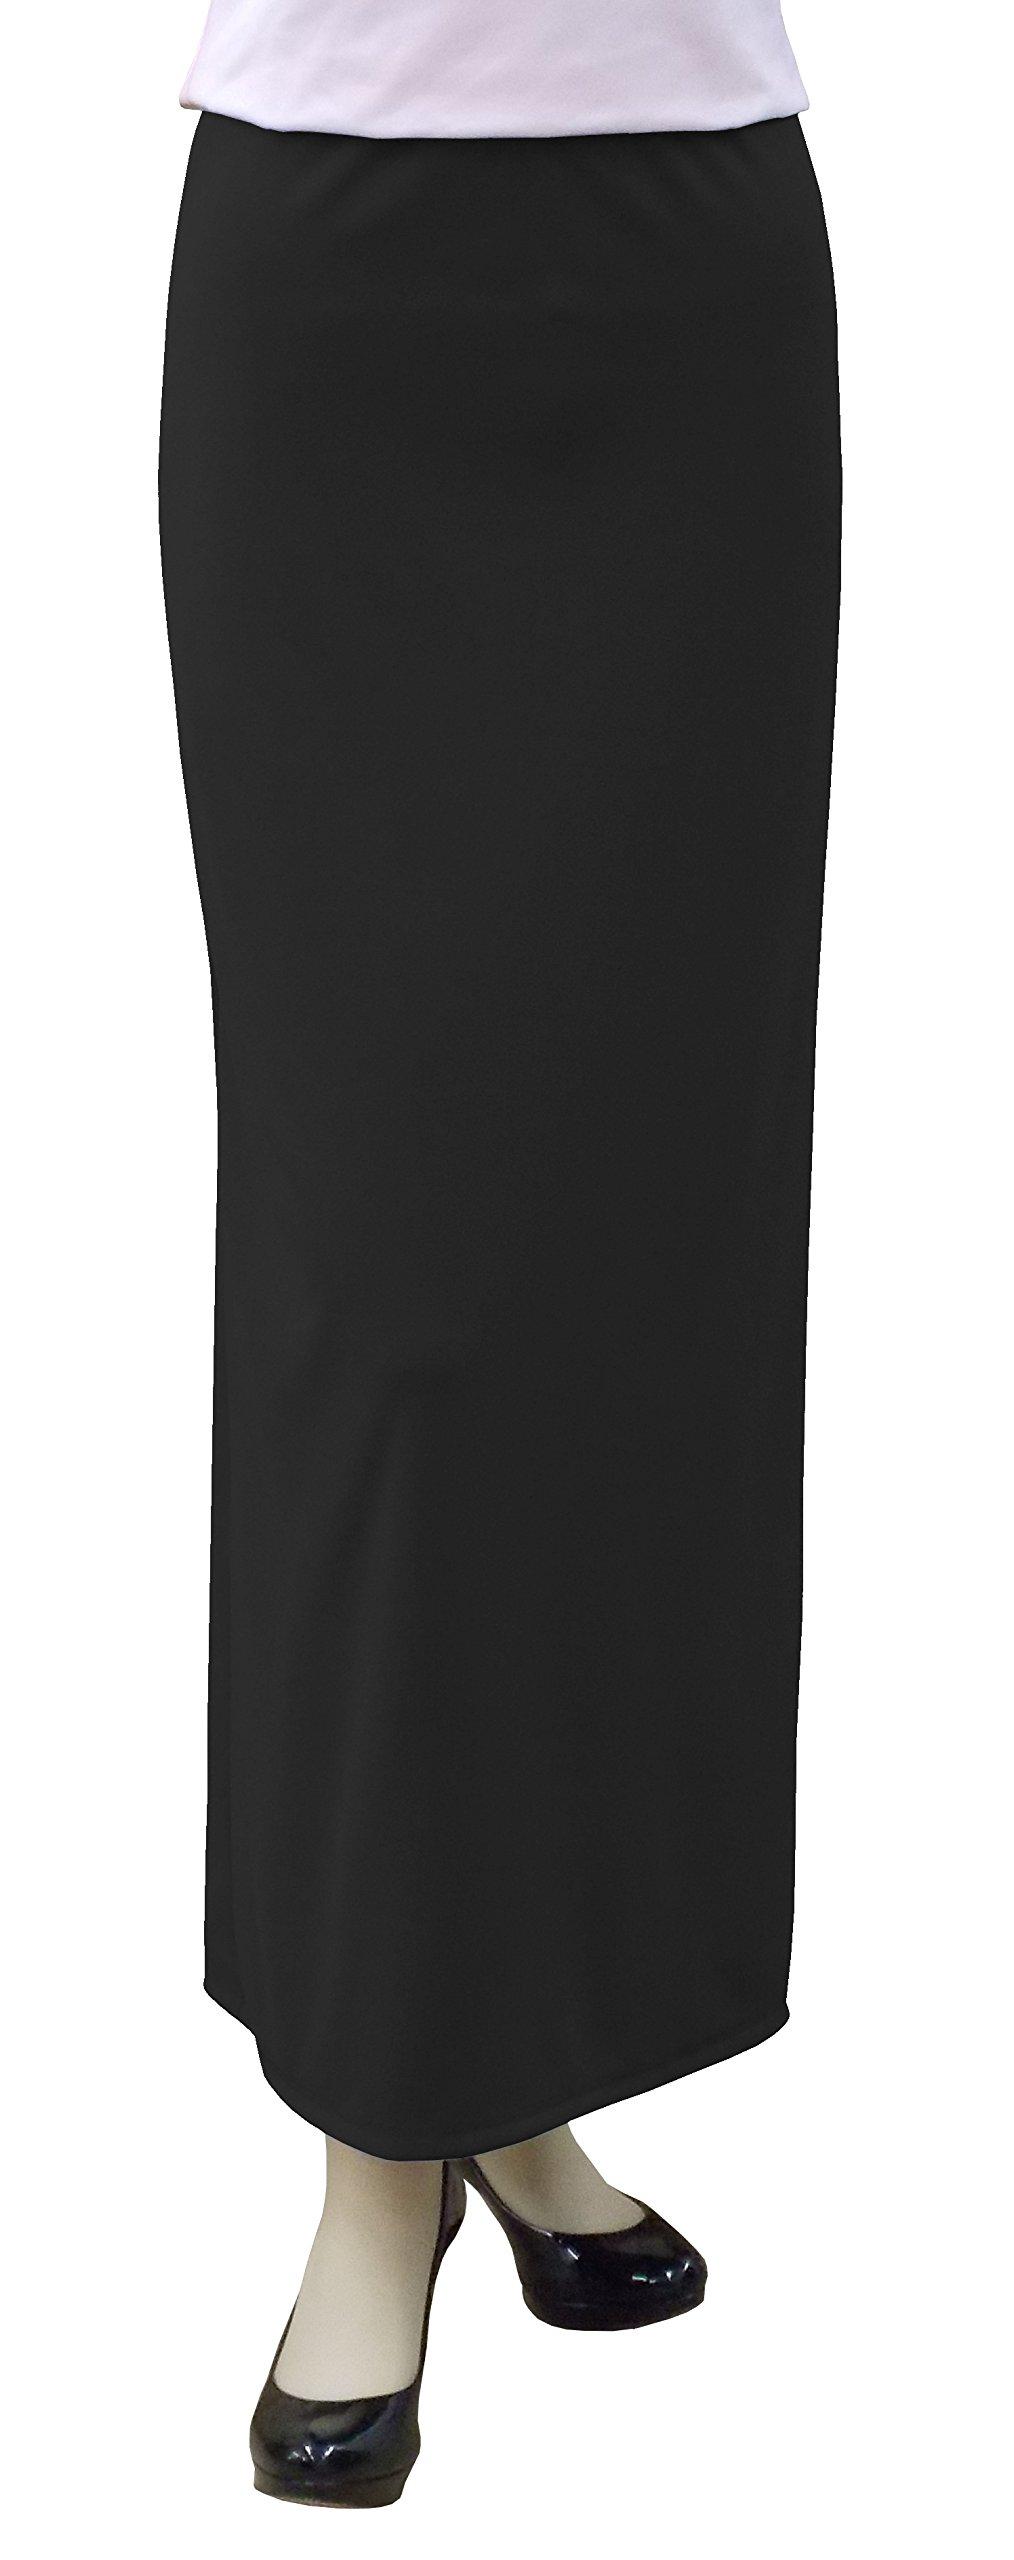 Baby'O Women's Basic Modest 37'' Ankle Length Stretch Knit Straight Skirt, BLK, 12